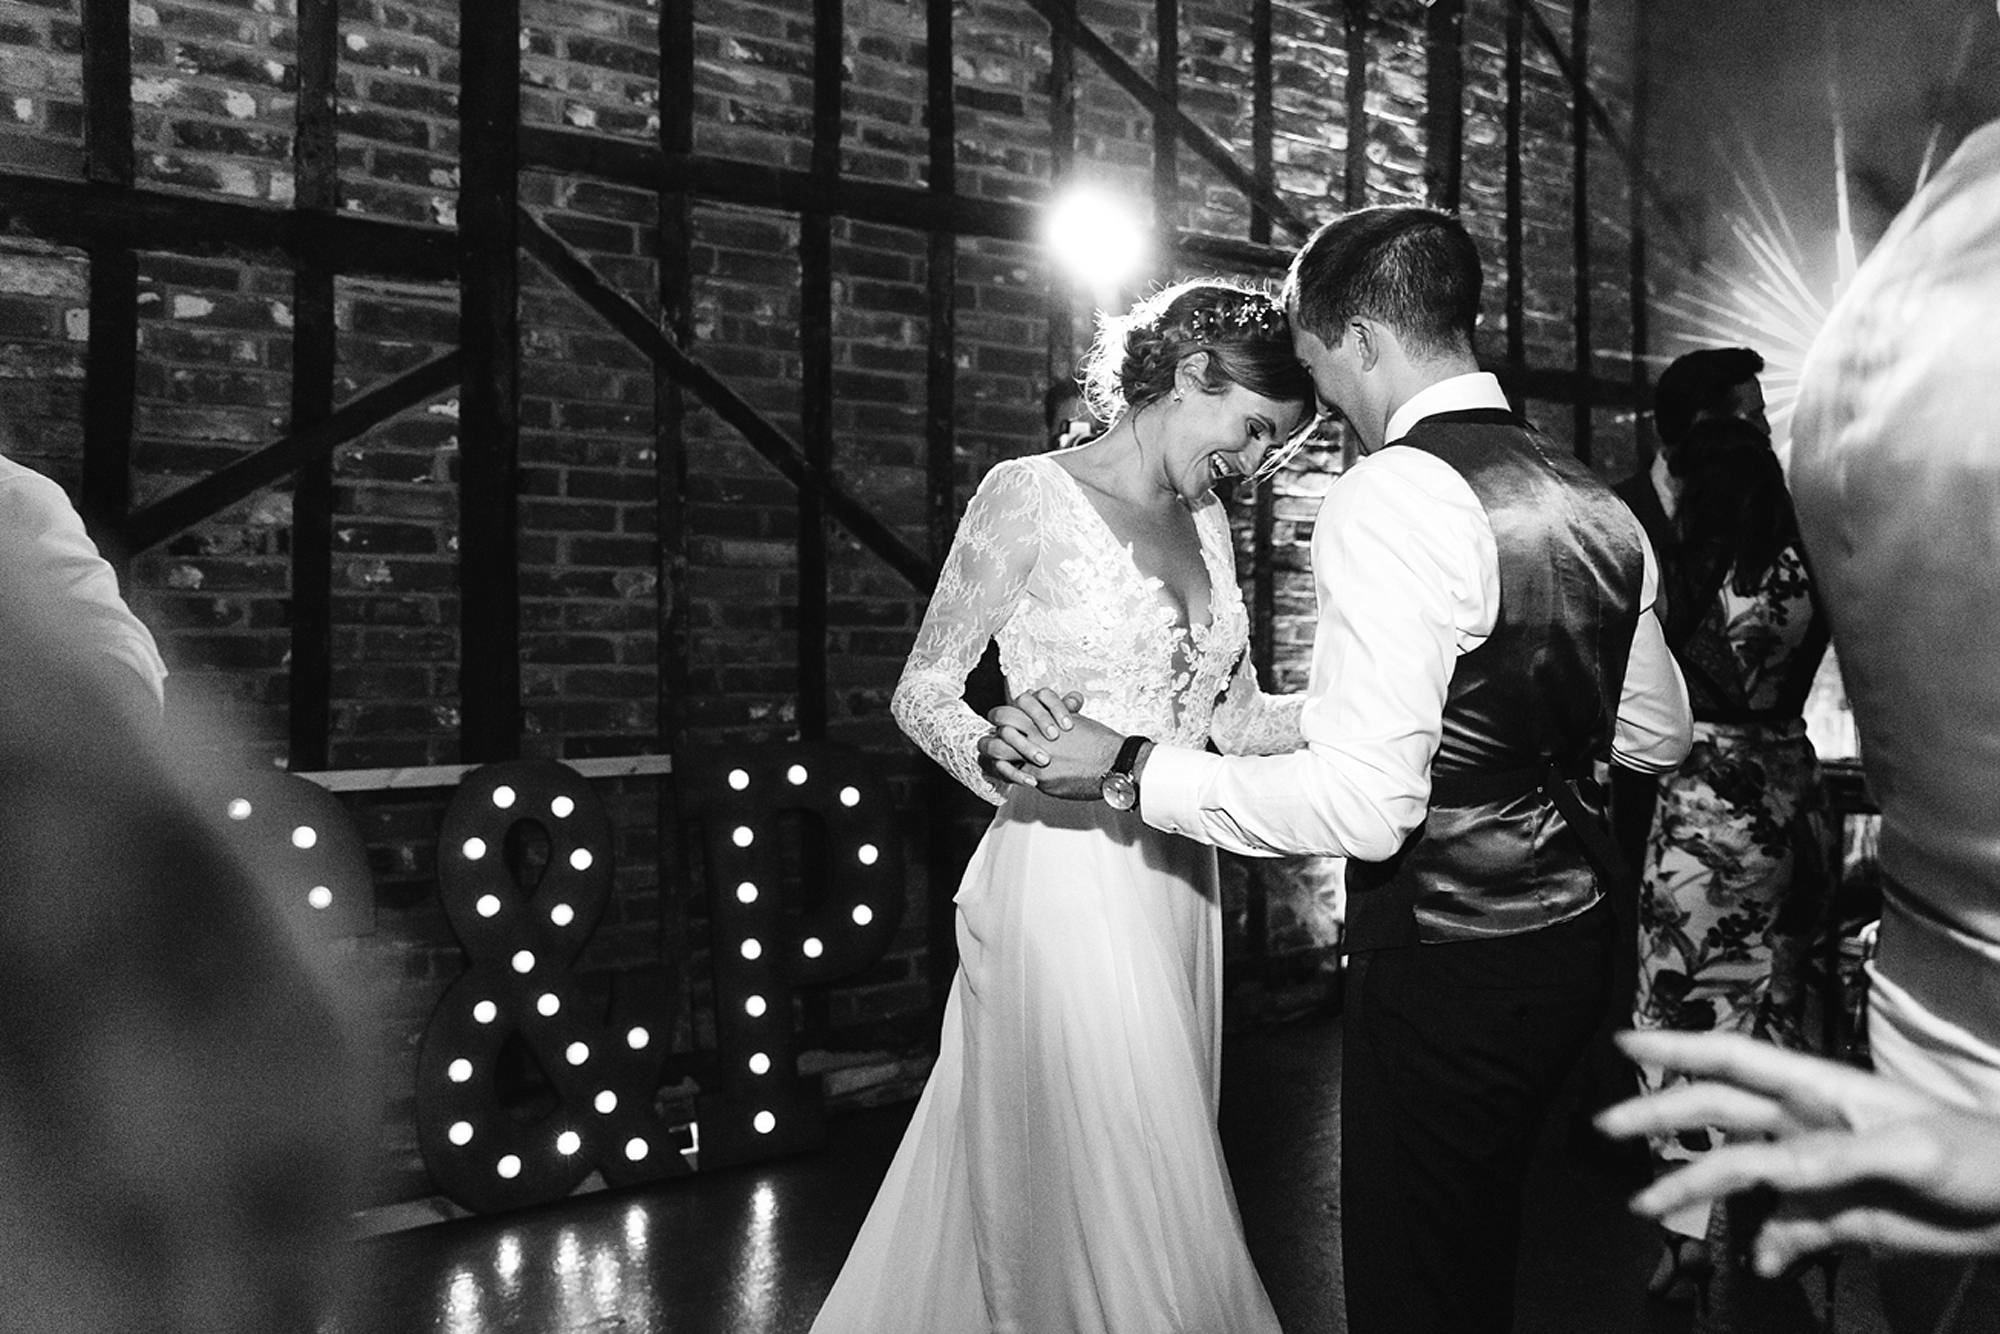 Marks Hall Estate wedding photography bride and groom dancing